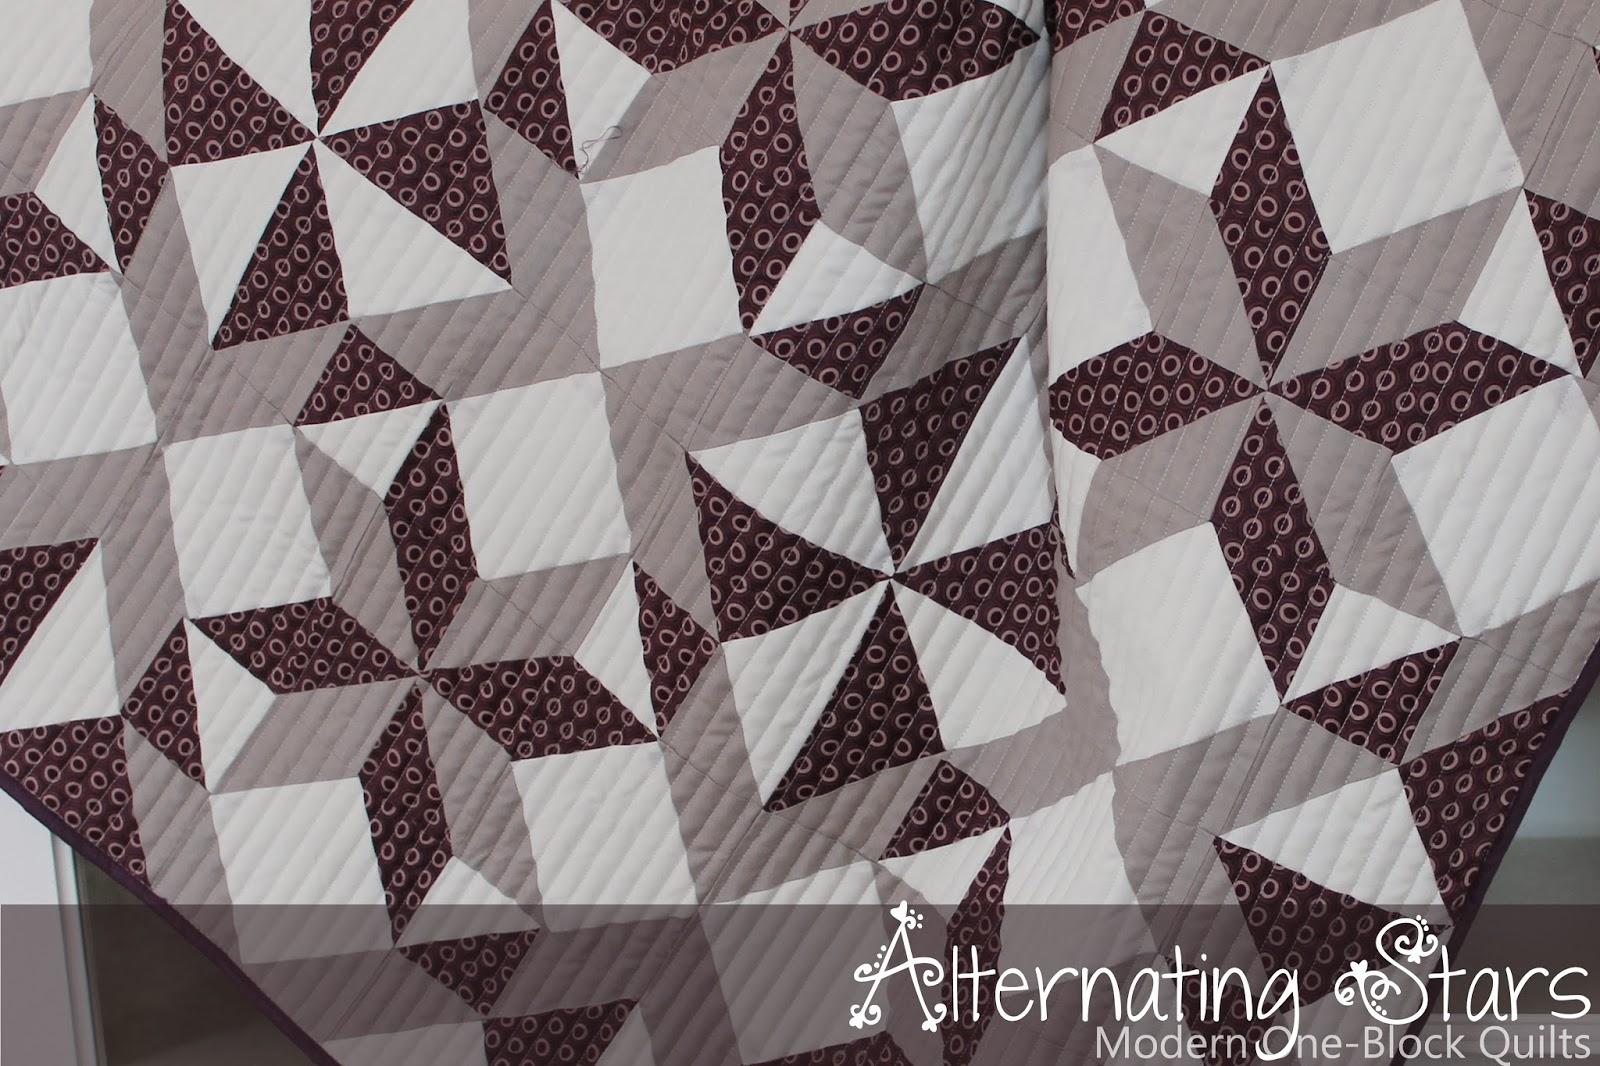 Piece N Quilt: Alternating Stars - A Modern One-Block Quilt : one block quilt - Adamdwight.com